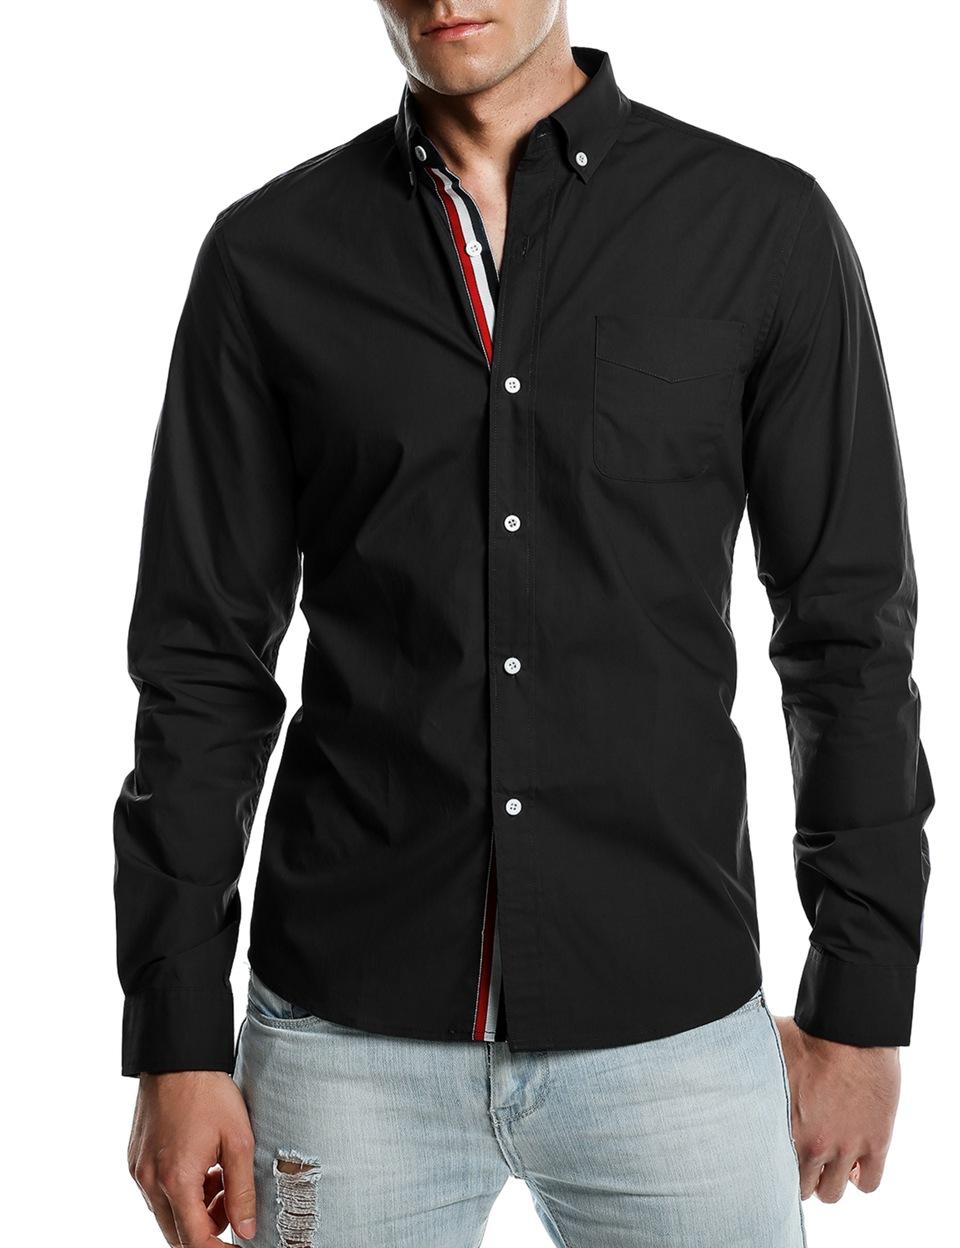 shirt (3)